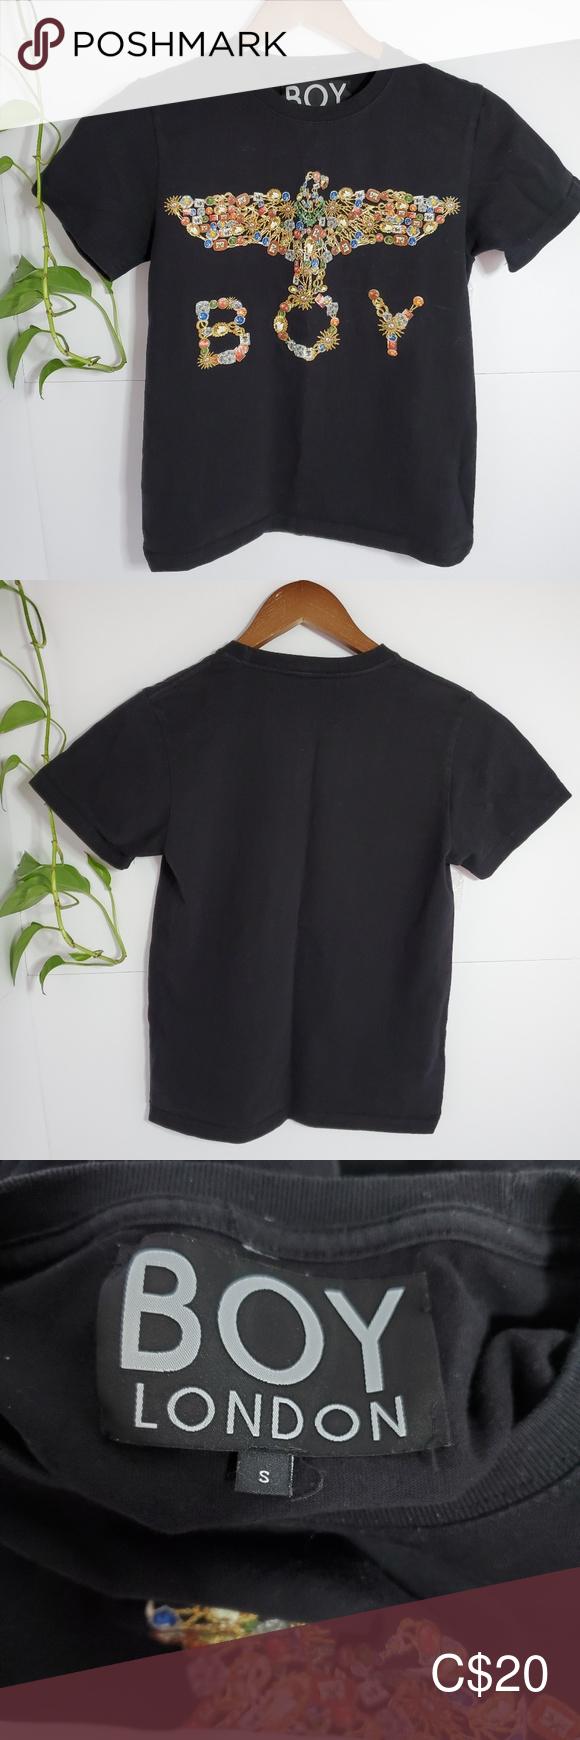 3 30 Boy London Embellished Tshirt Small Boy London Women Shopping Embellished Tshirt [ 1740 x 580 Pixel ]